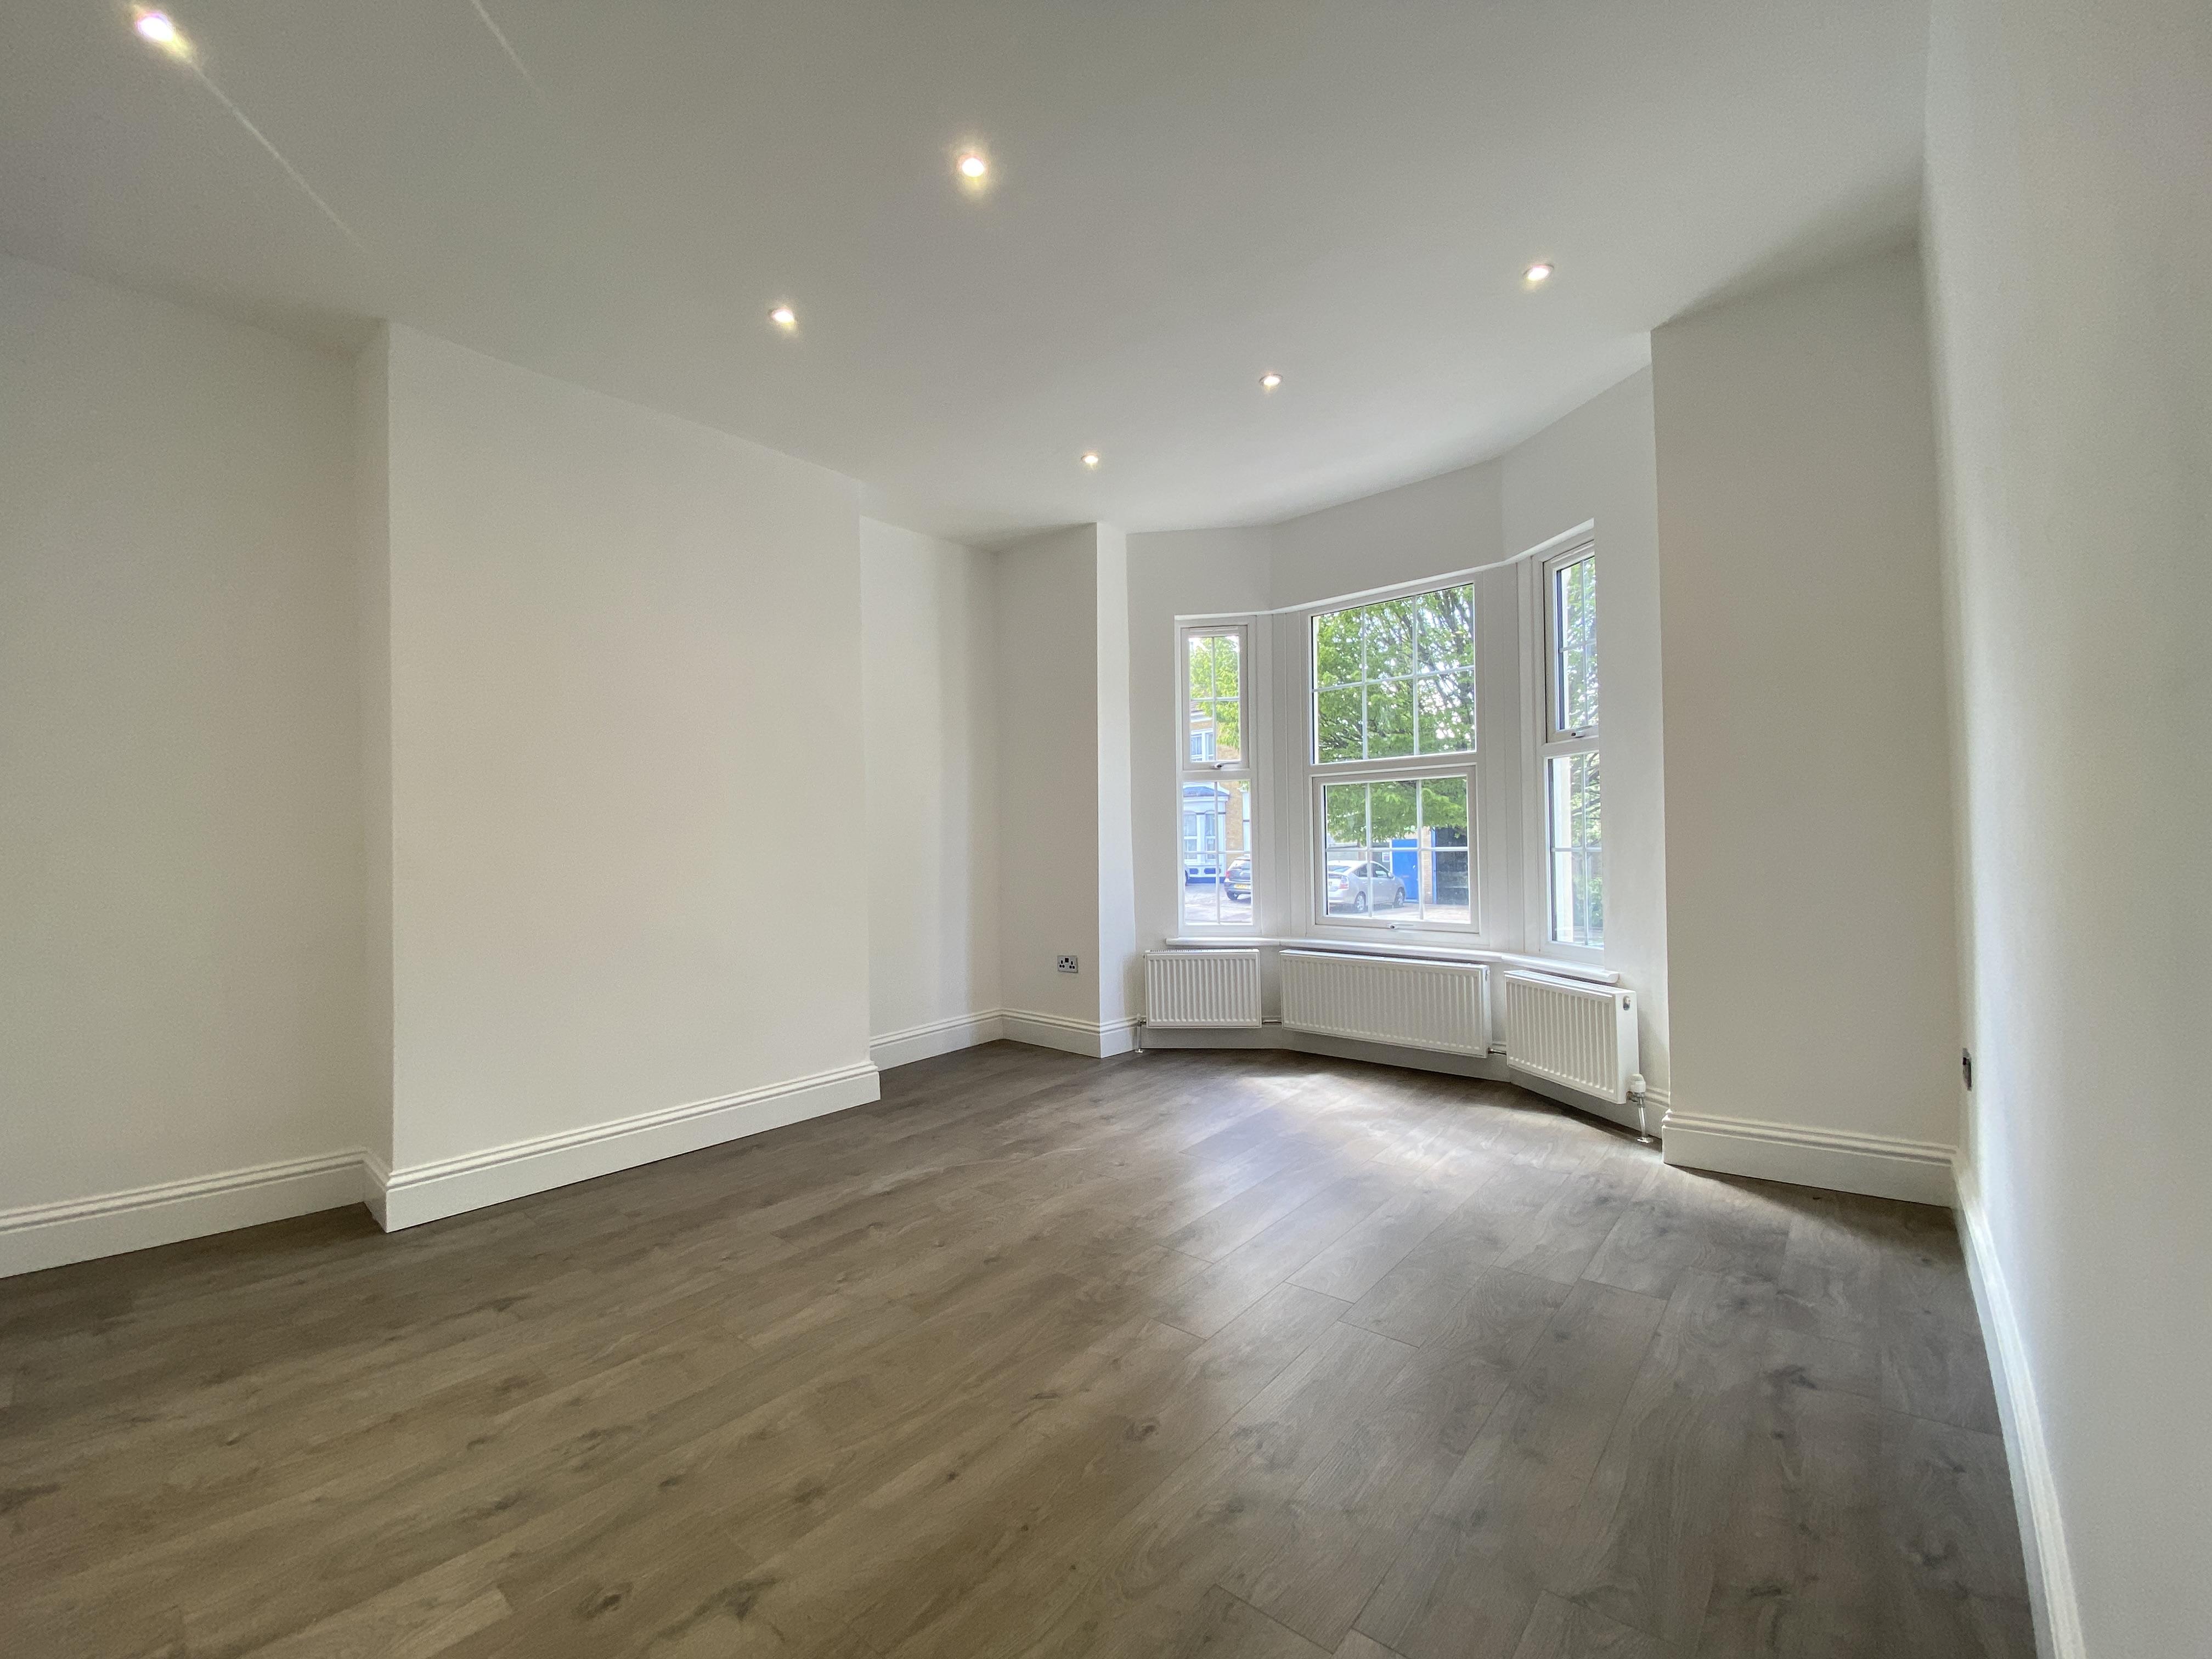 2 bed flat to rent in The Grove, Gravesend, DA12